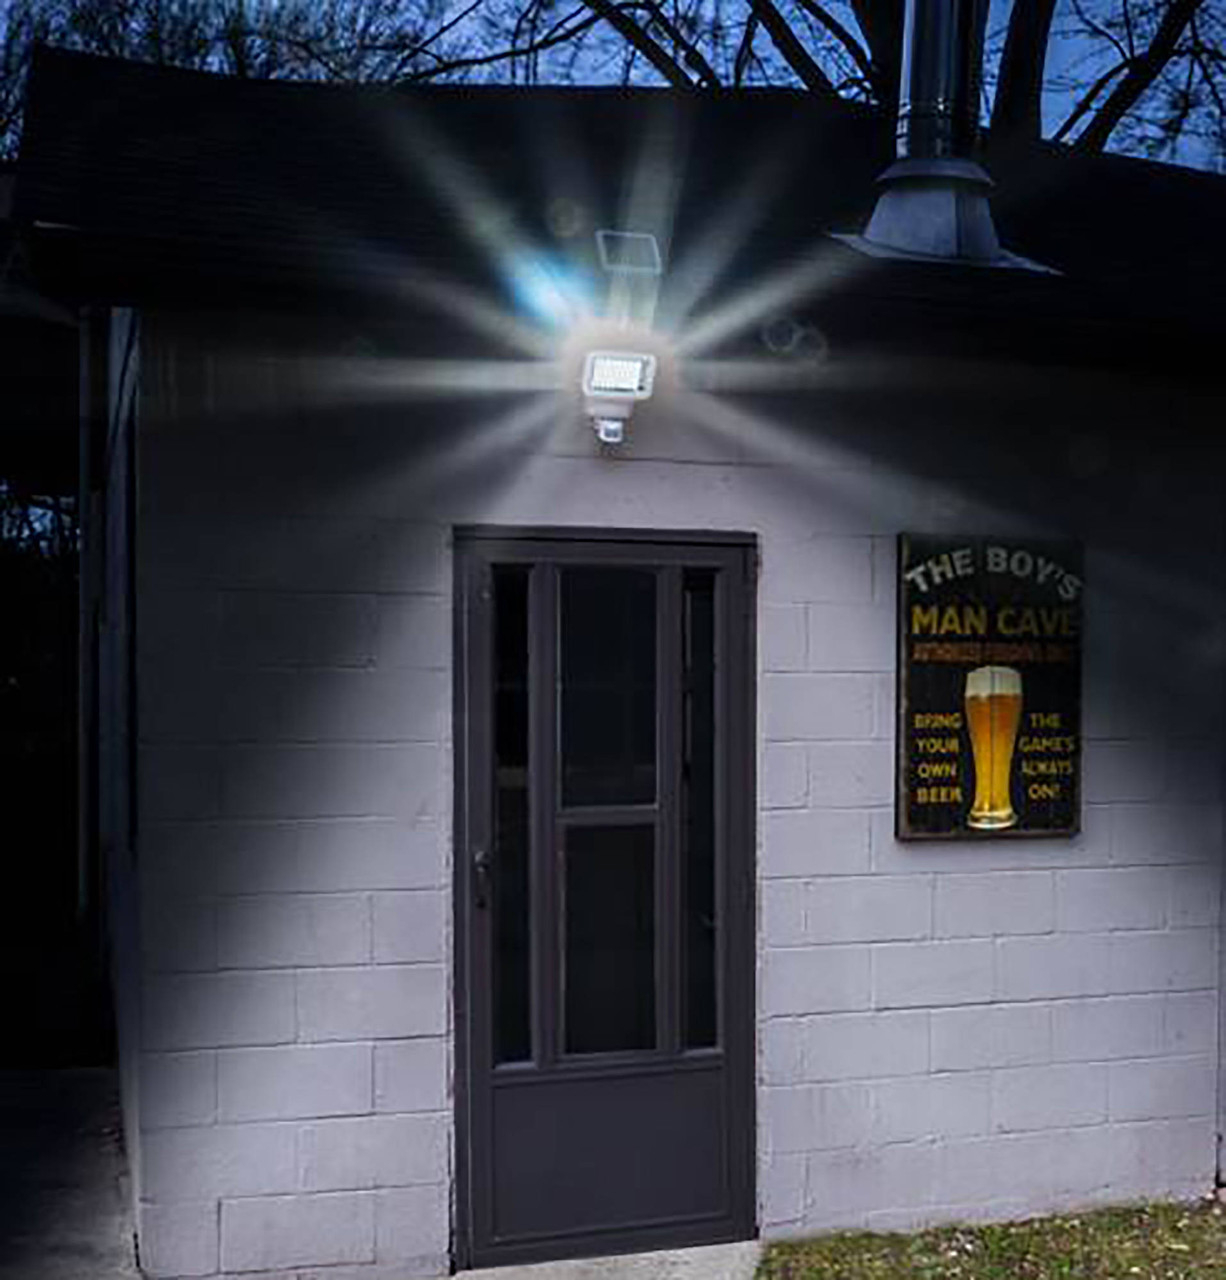 Super Bright Solar Motion Sensor Security Light from Classy Caps at Night